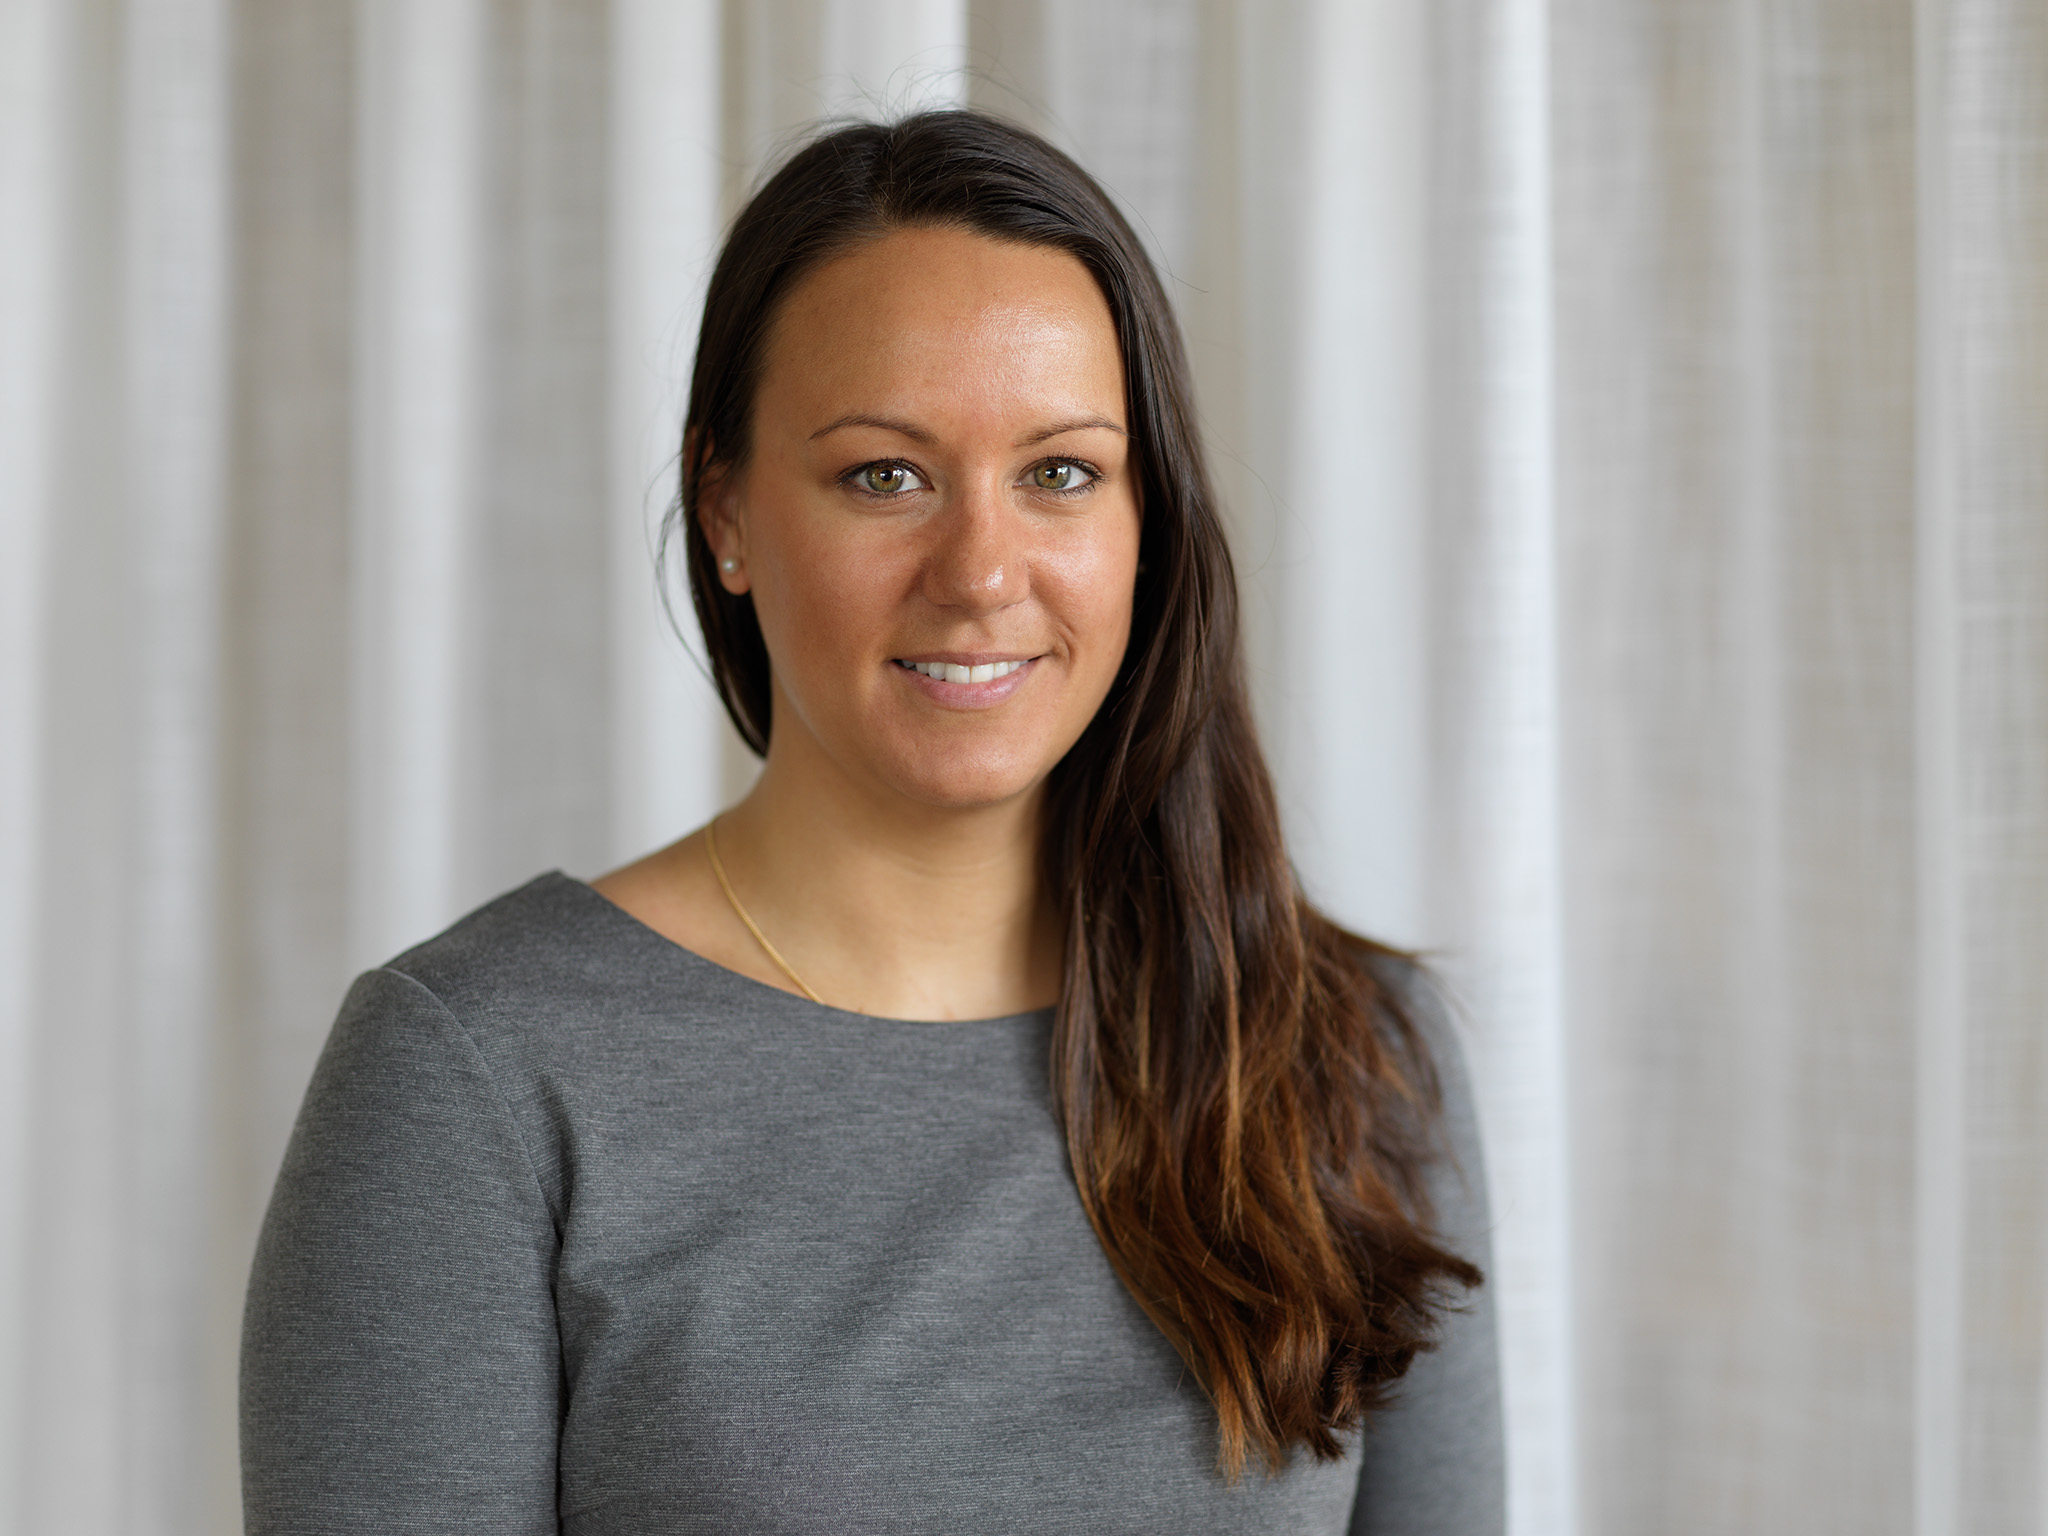 Ulrika Backlund